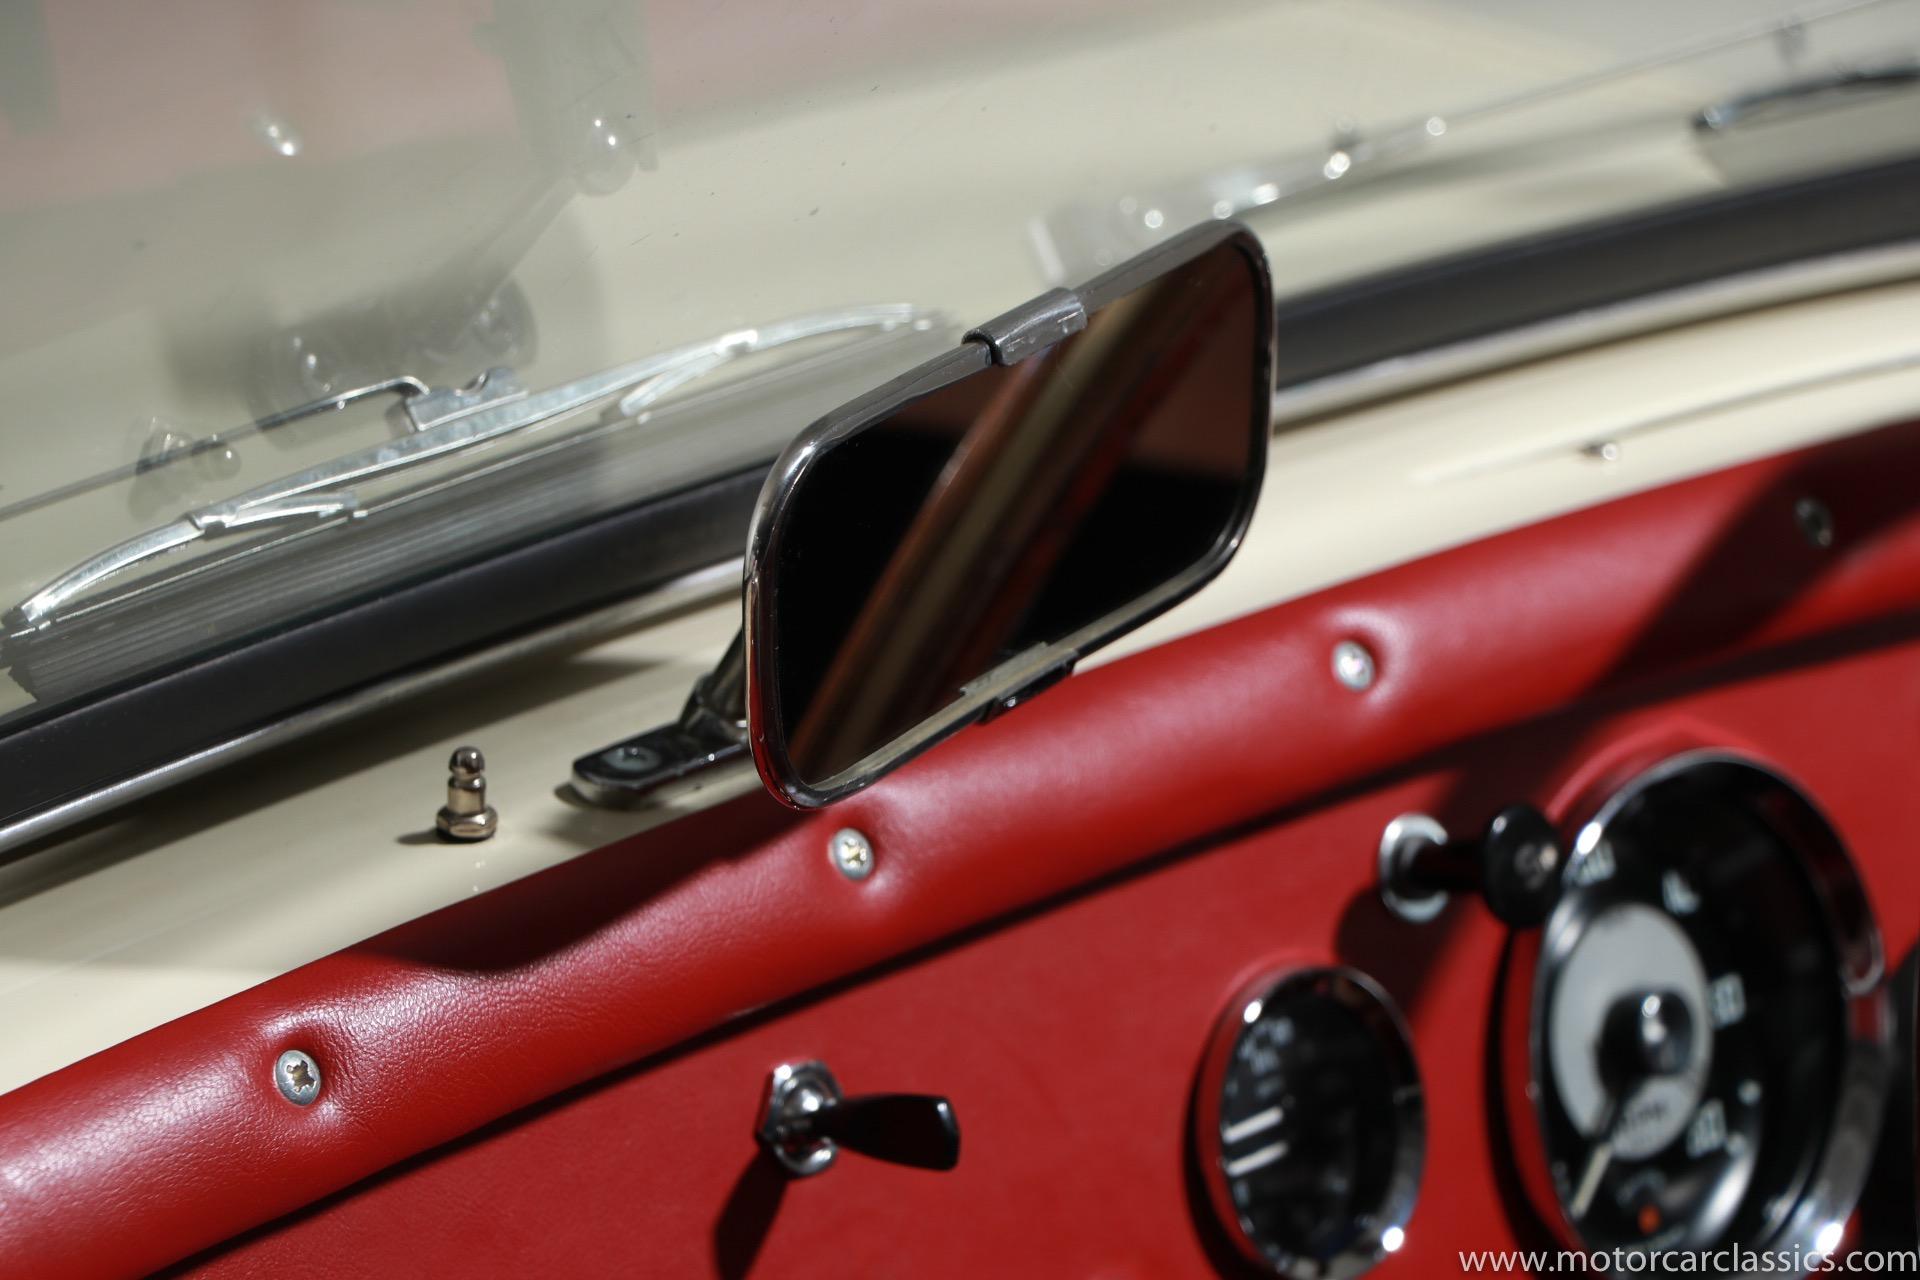 1959 Austin-Healey Frogeye Sprite MK1